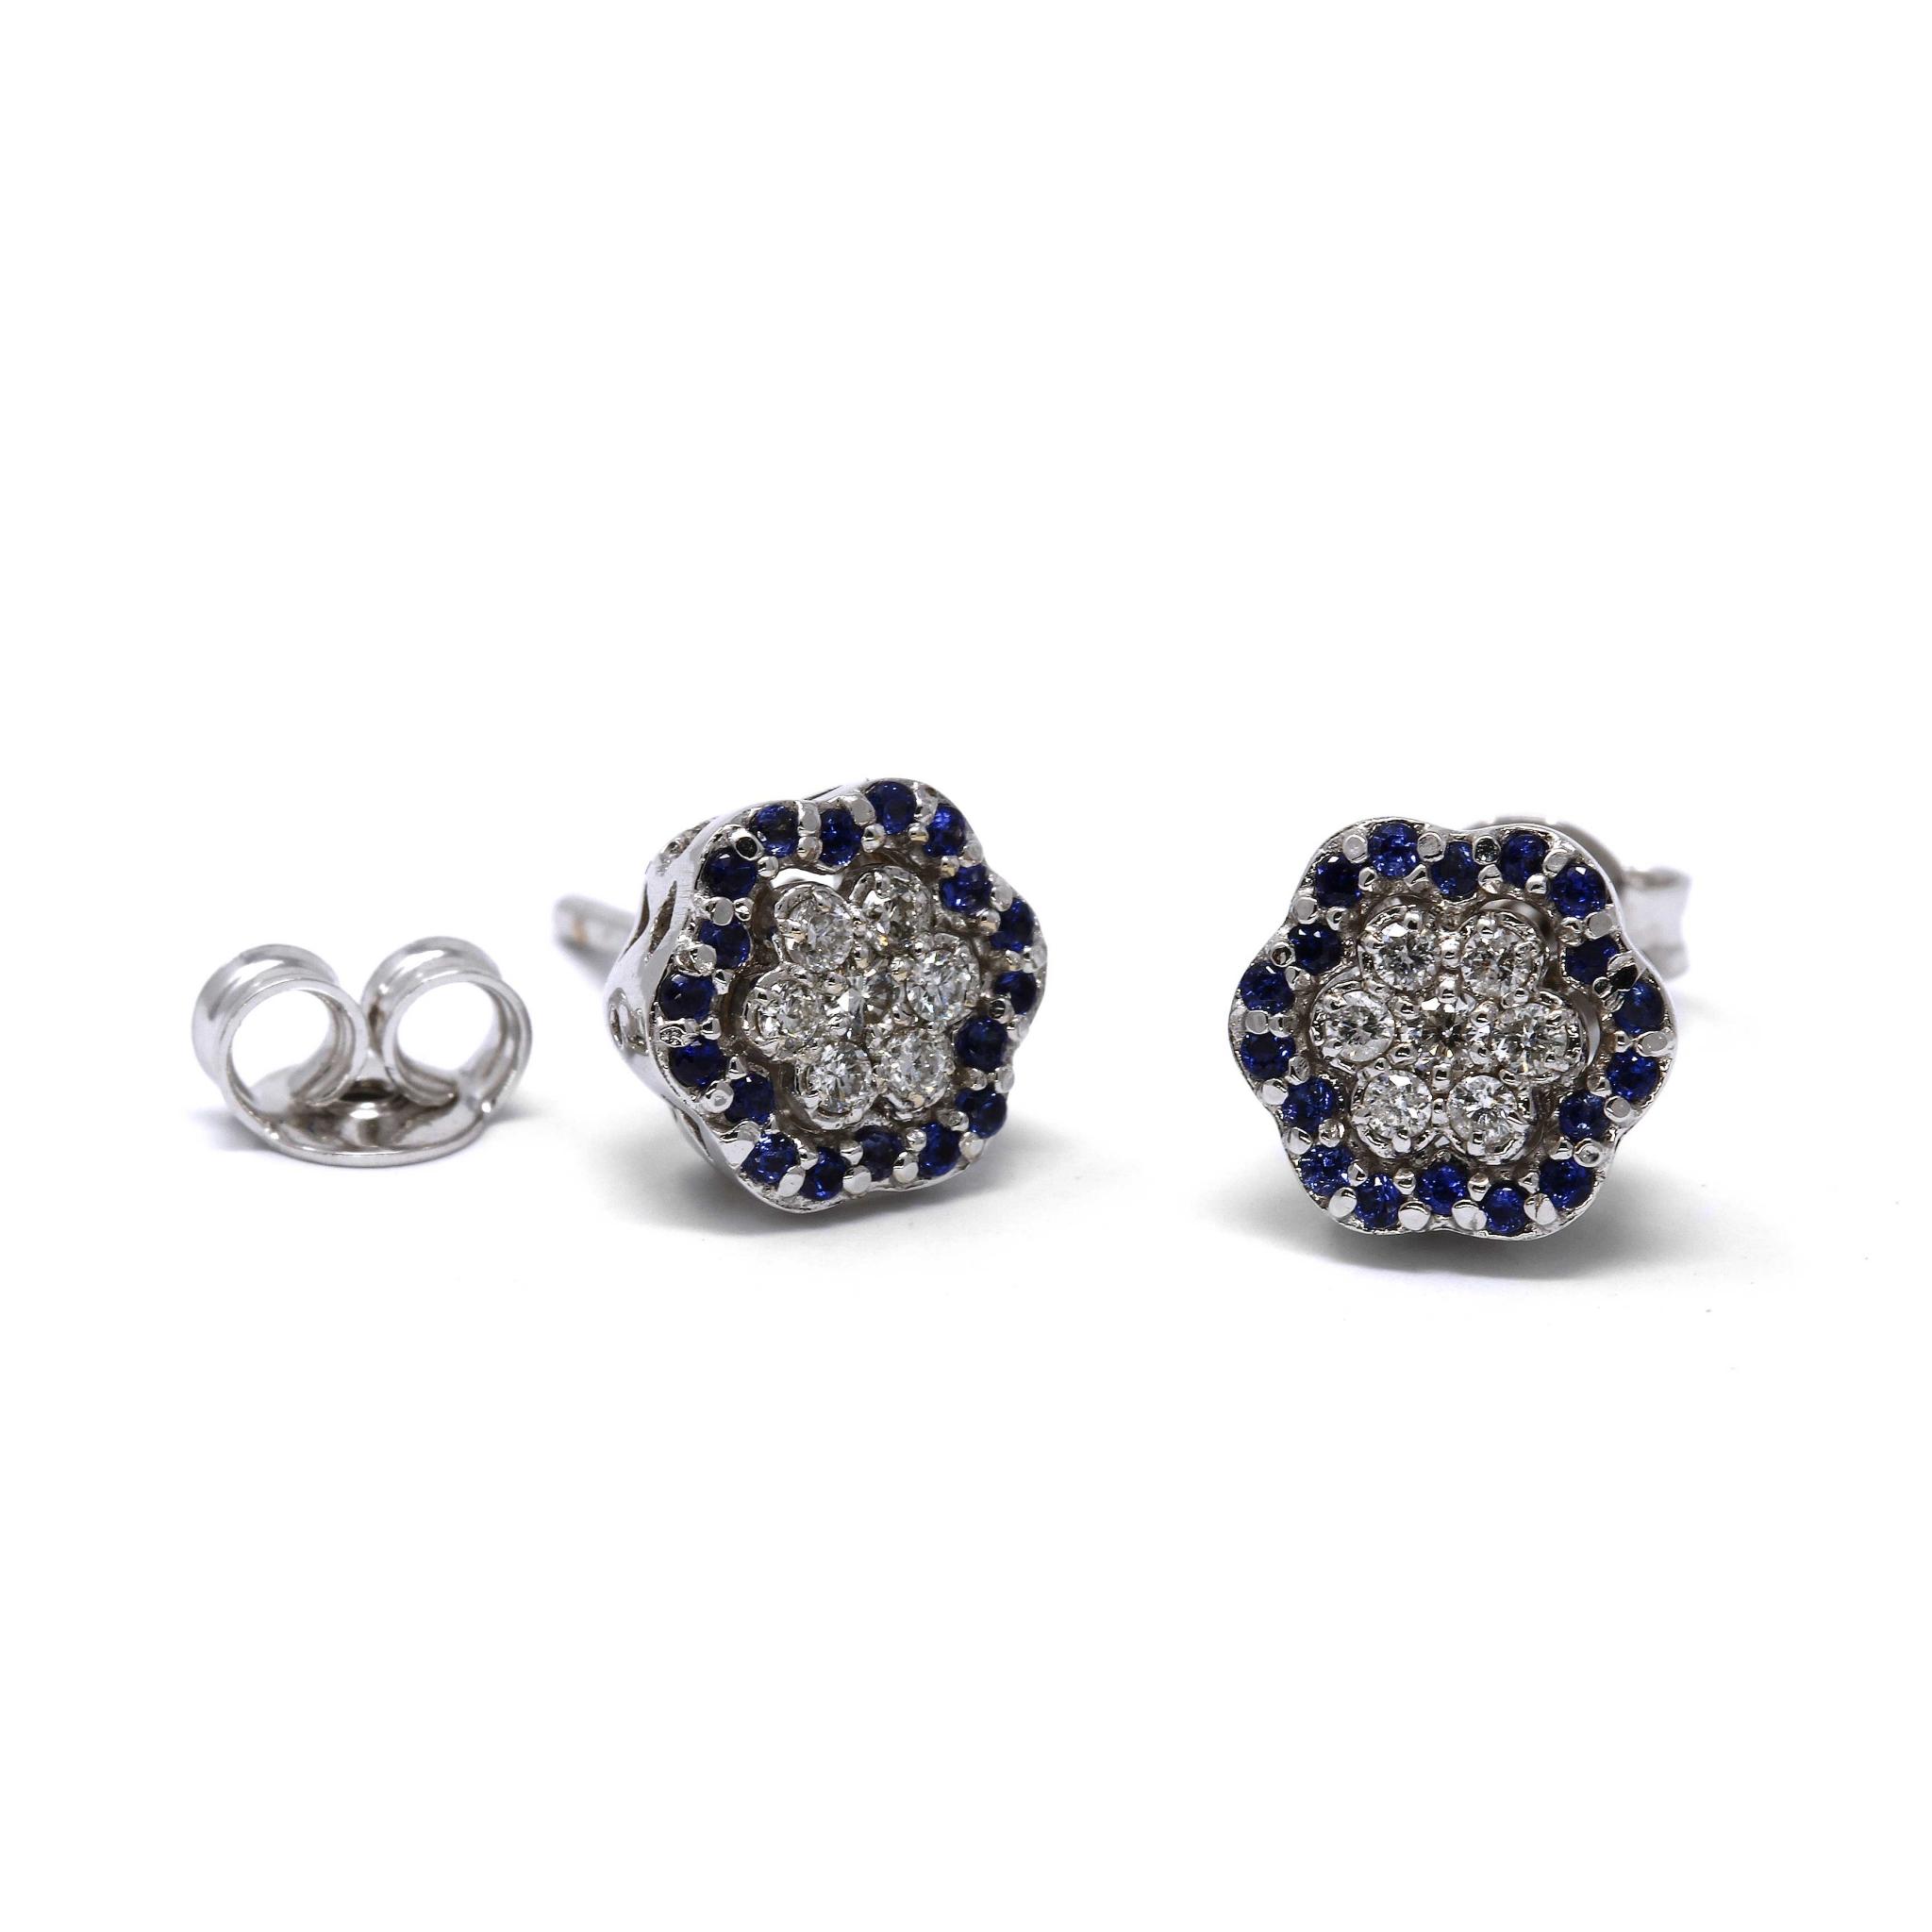 Orecchini Margherita 36 Zaffiri CT 0.18 e 14 Diamanti CT 0.20